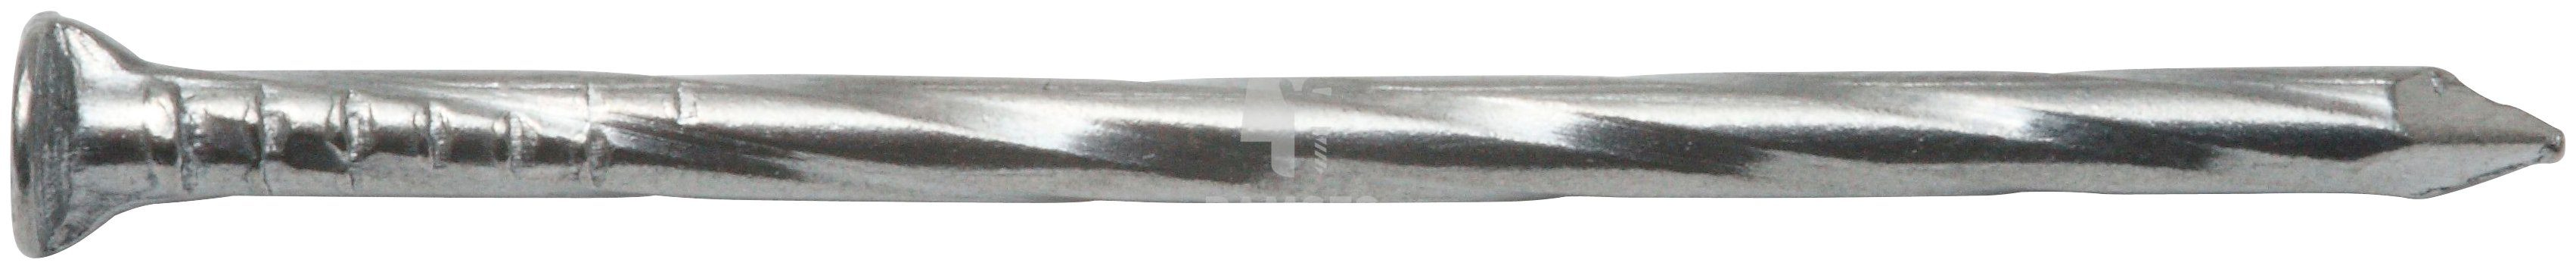 RAMSES Nagel , Senkkopf geriffelt 2,05 x 40 mm Stahl blank